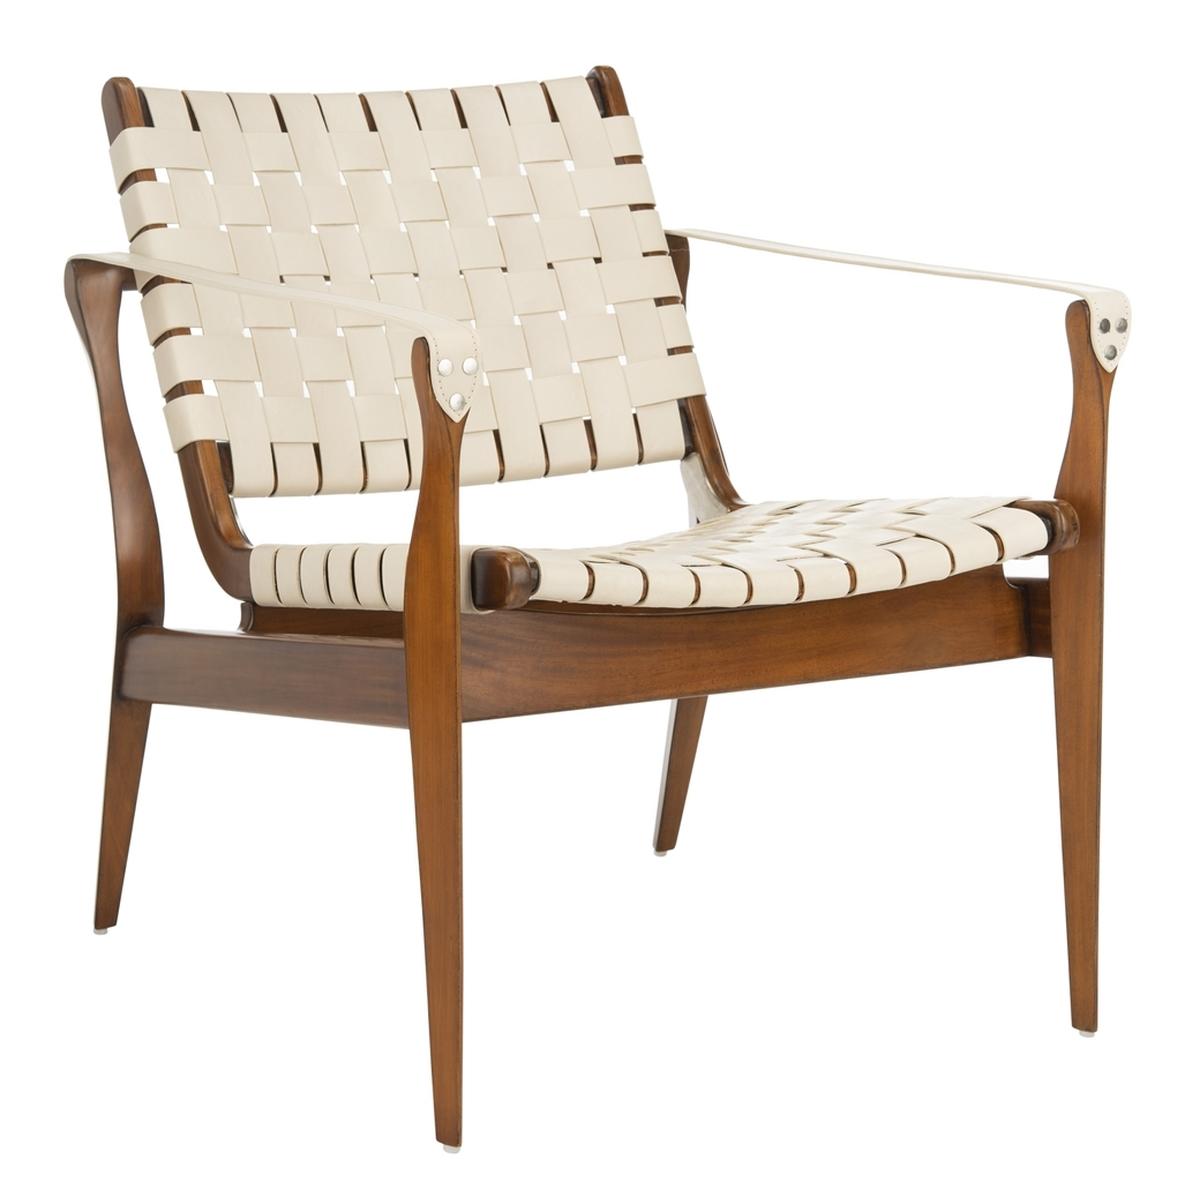 Astonishing Mid Century Modern Woven Leather Strap Armchair Safavieh Creativecarmelina Interior Chair Design Creativecarmelinacom